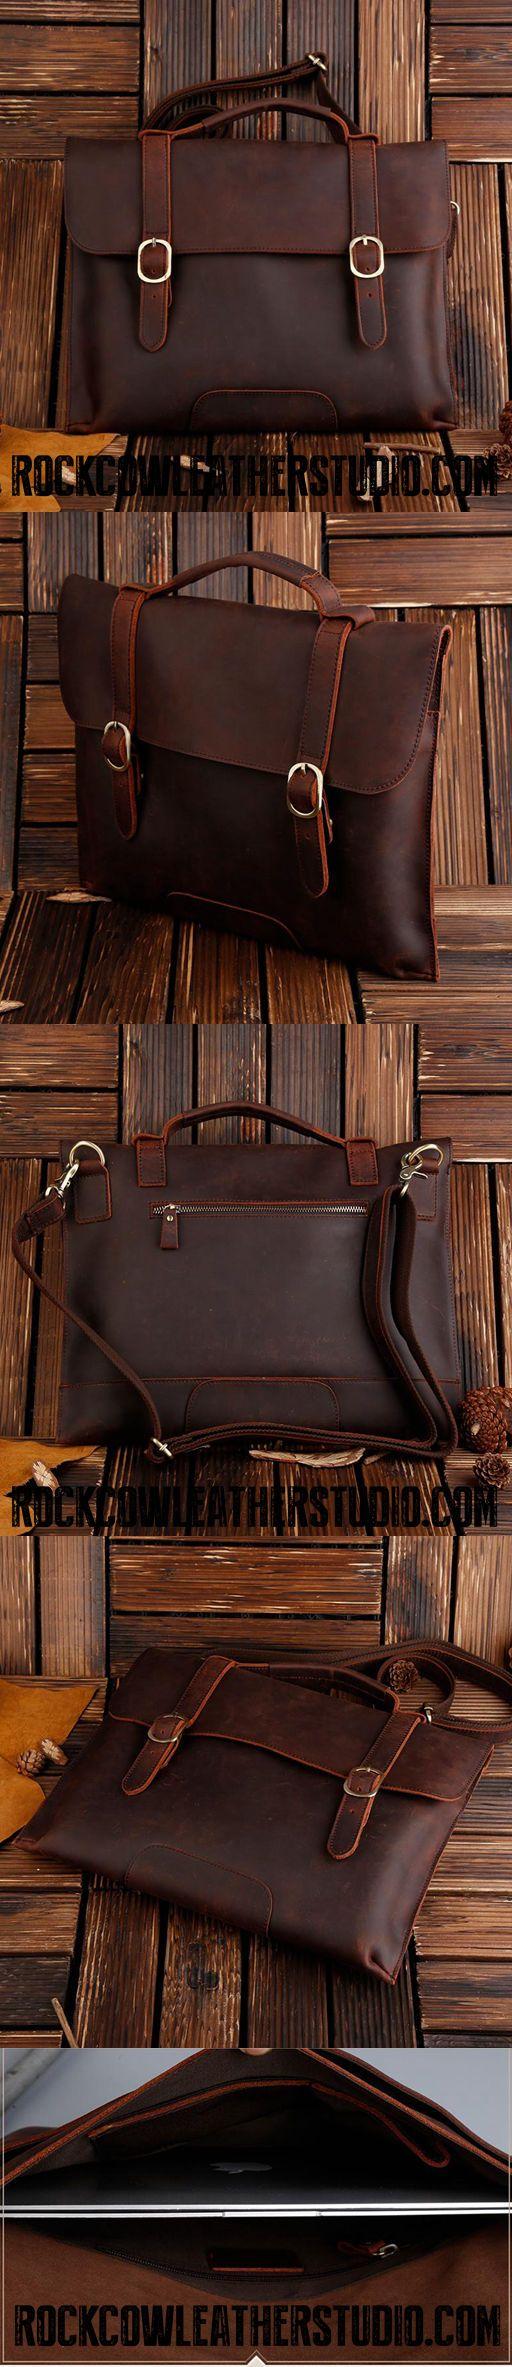 ROCKCOW Real Leather Messenger Bag Cross Body Satchel Brown Bag Briefcase 1132